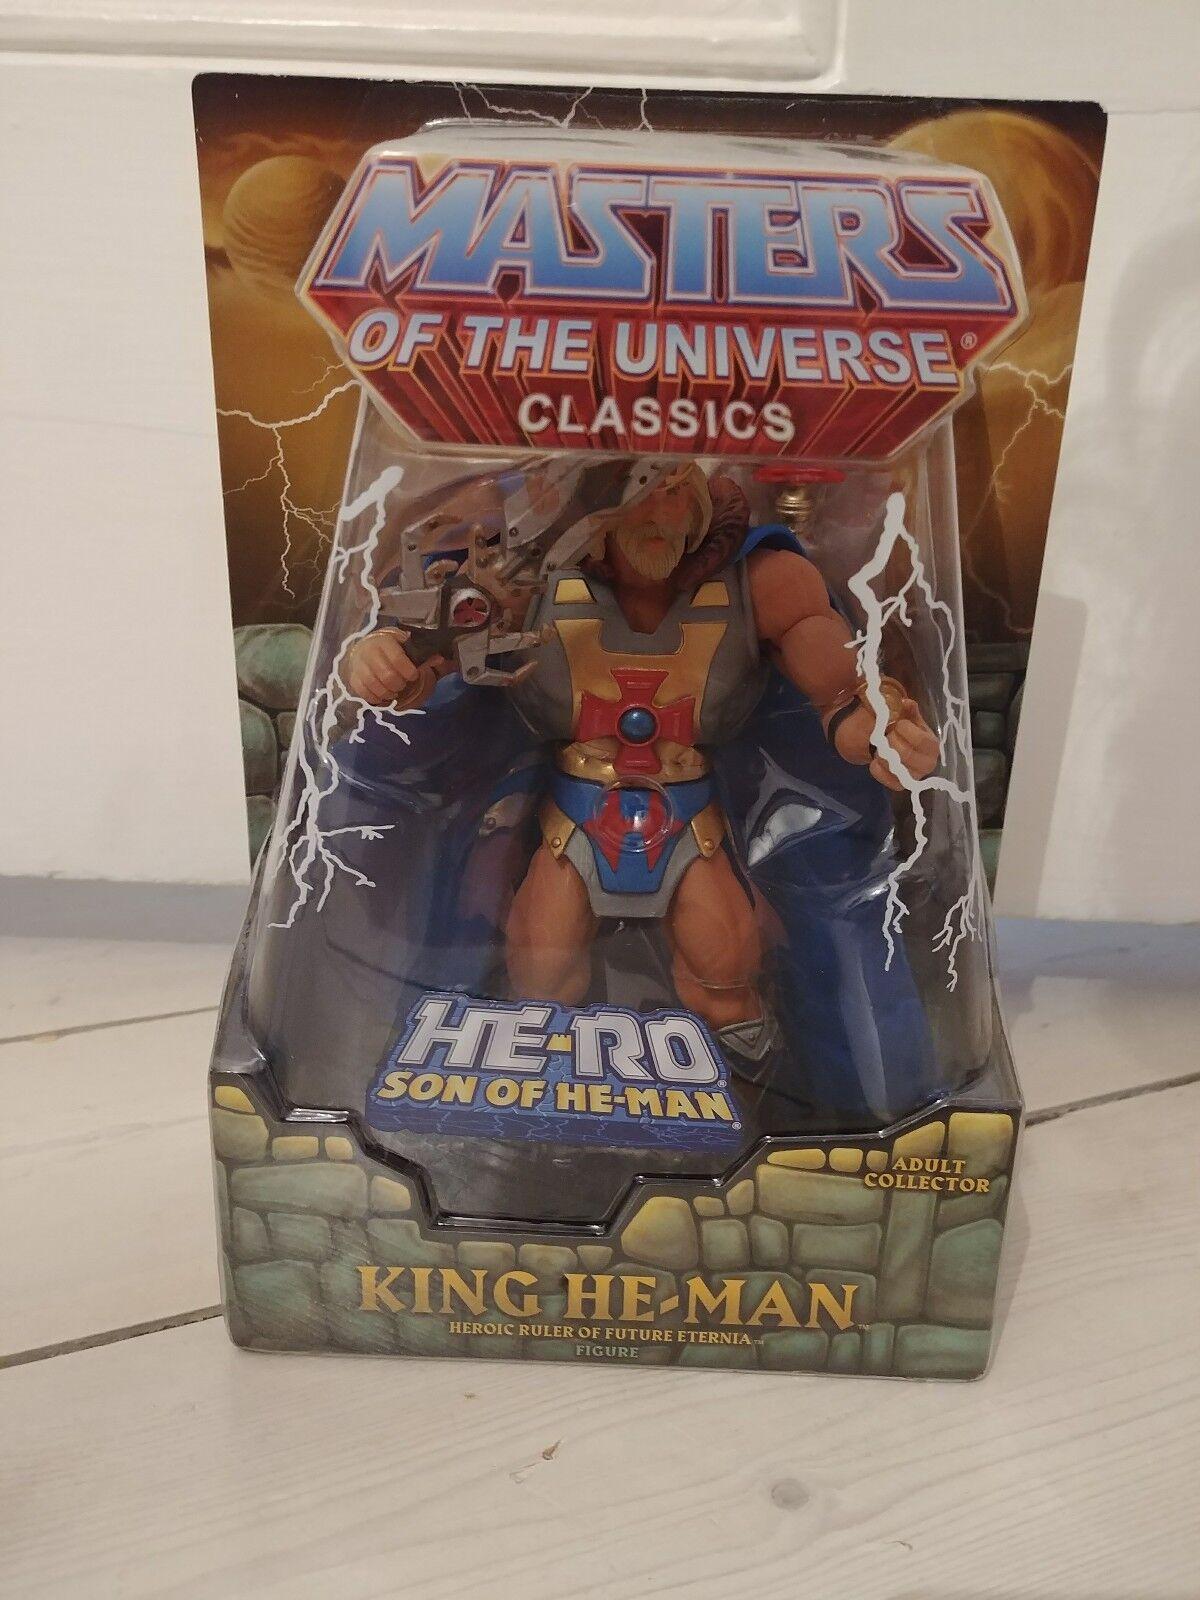 King He-Man Masters of the Universe Classics Motuc-Con Mailer, FUMETTO mancante